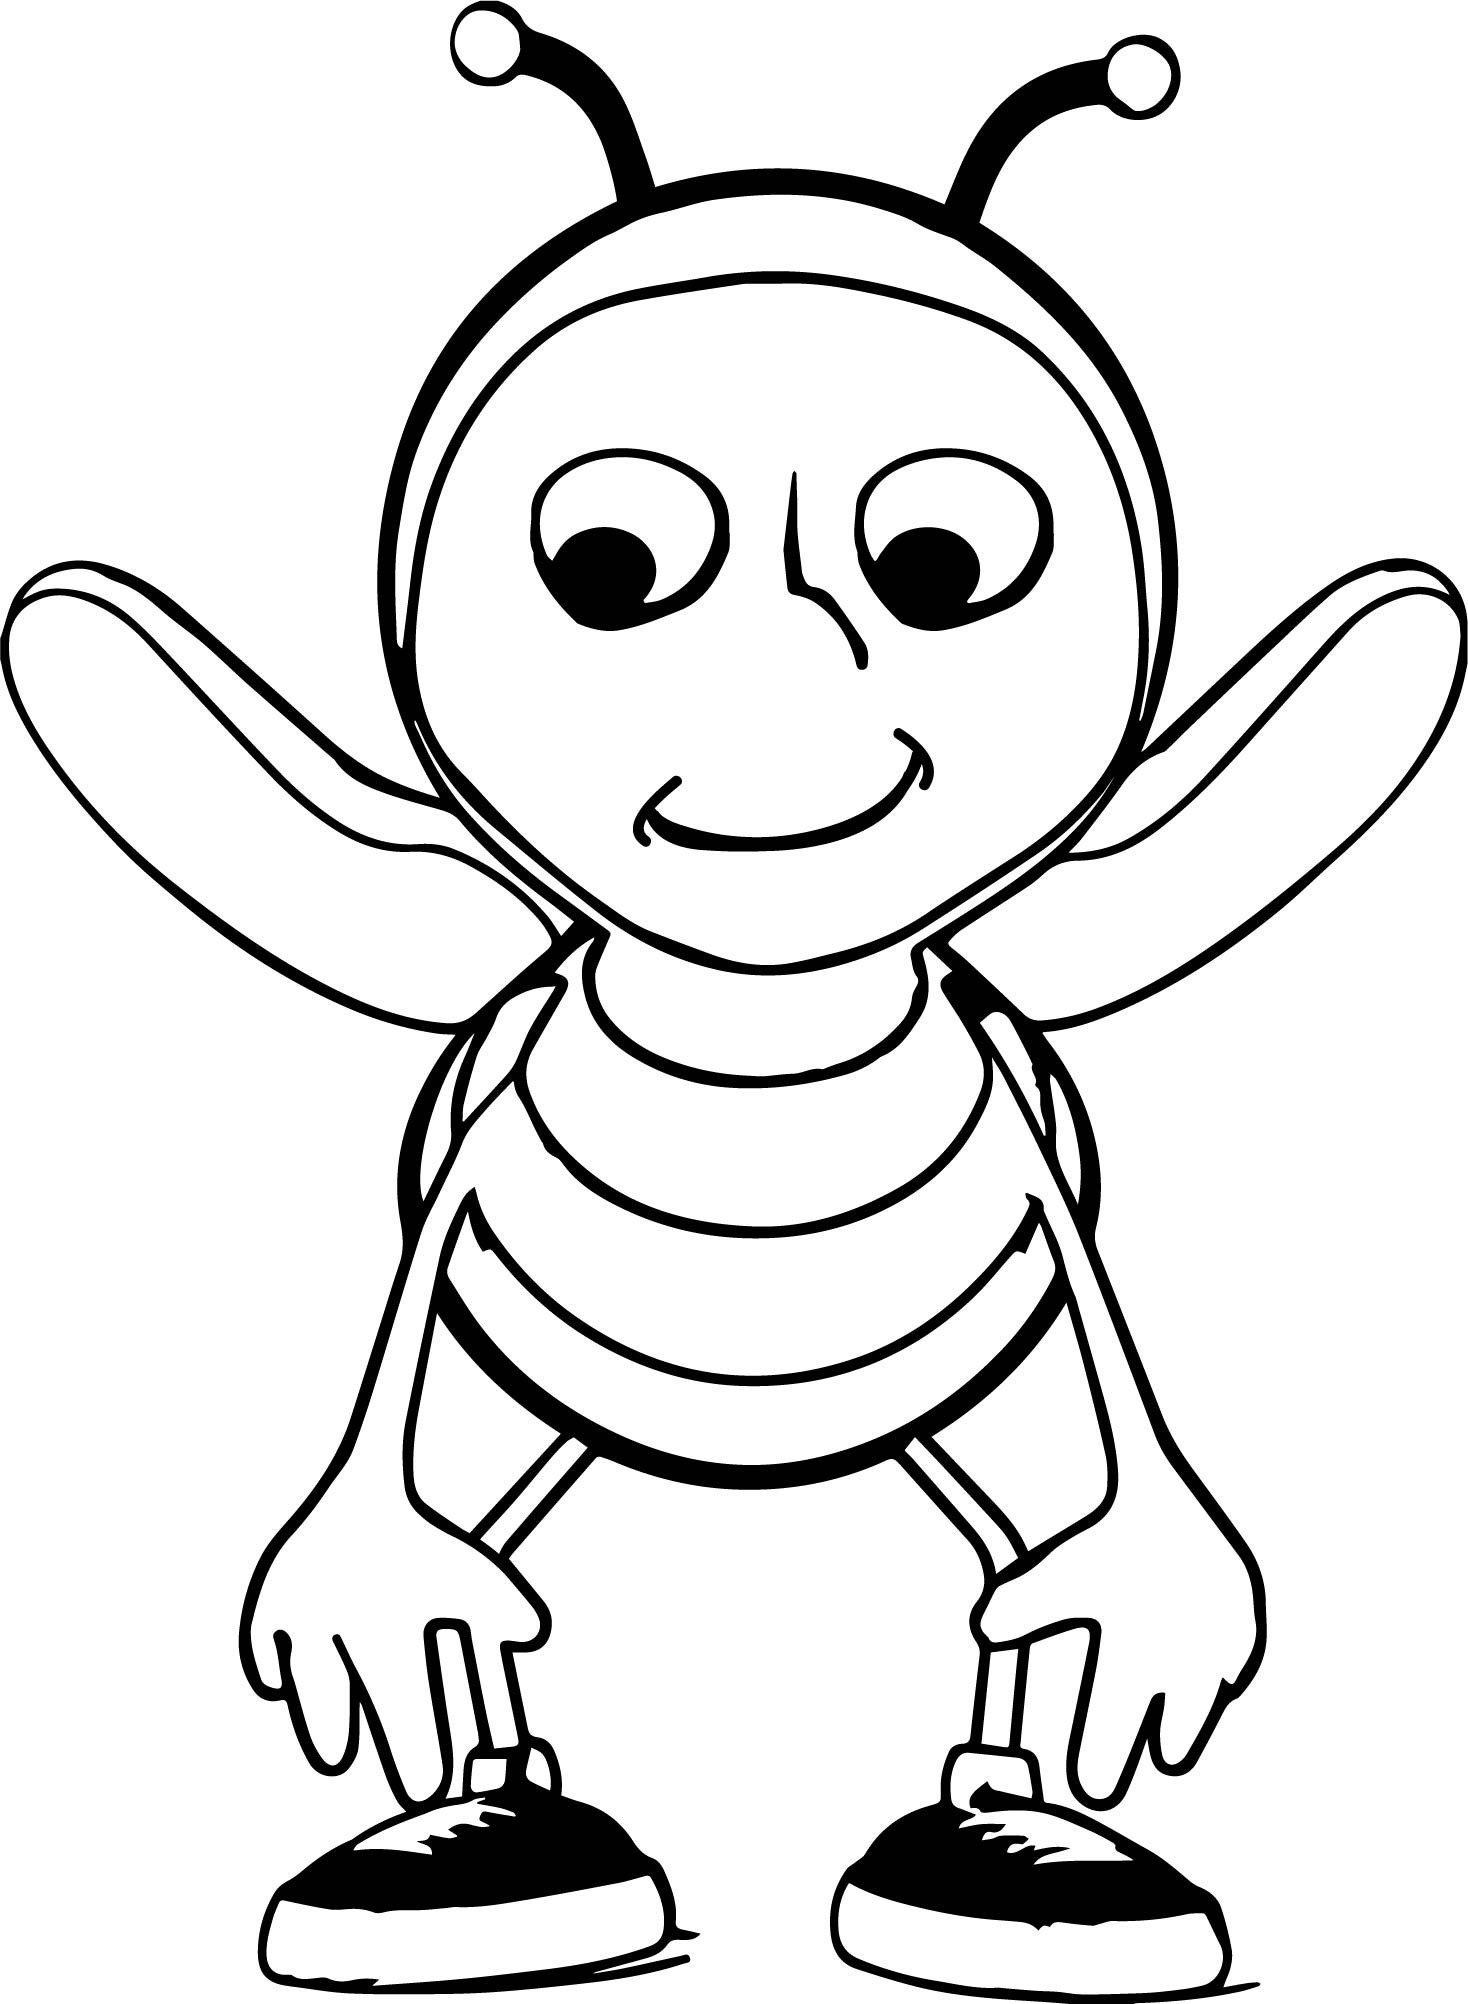 Bumble Bee Children Coloring Page   Kopya